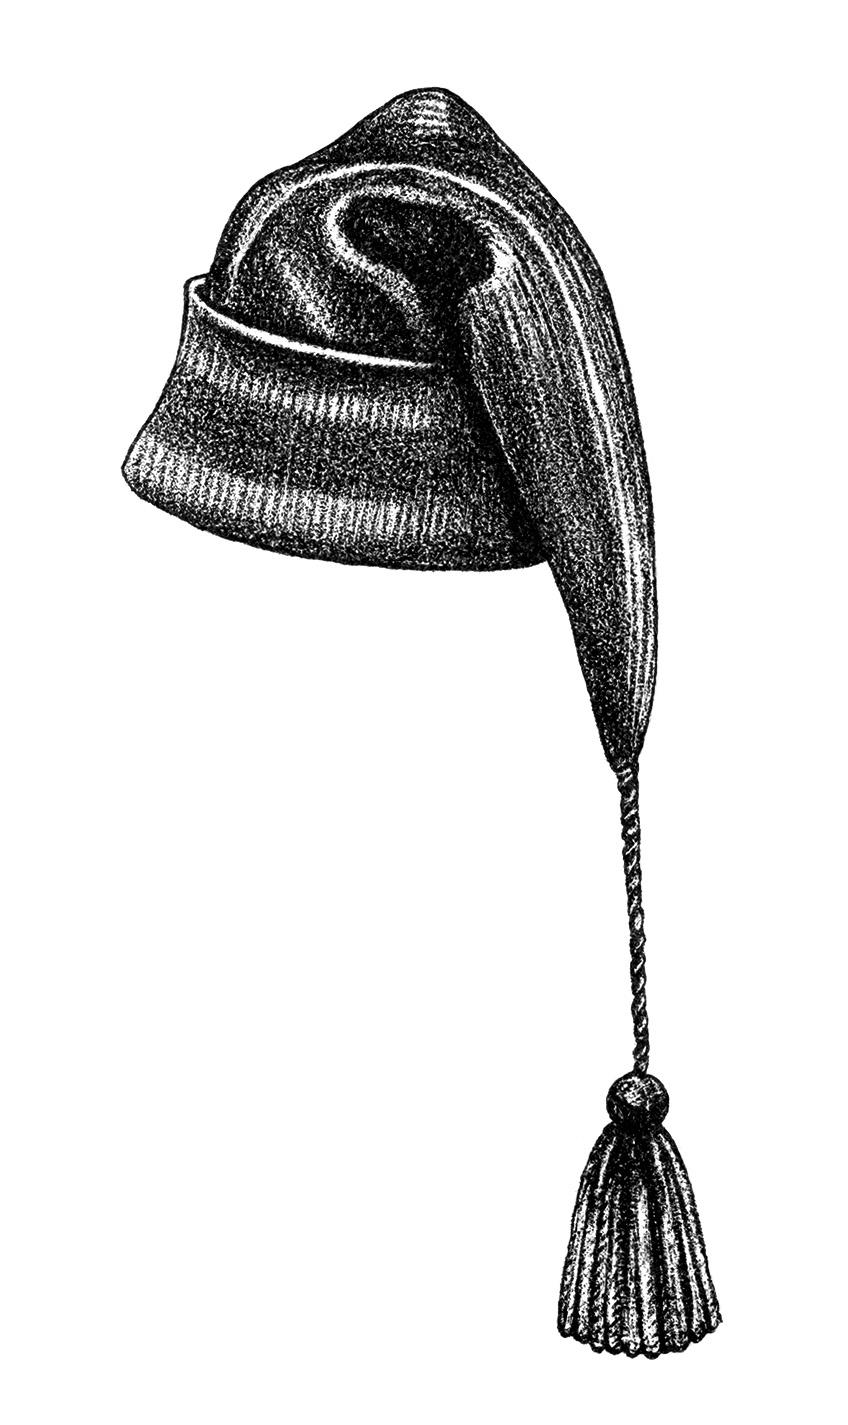 Winter hat vintage hat clipart warm winter toque long with tassel